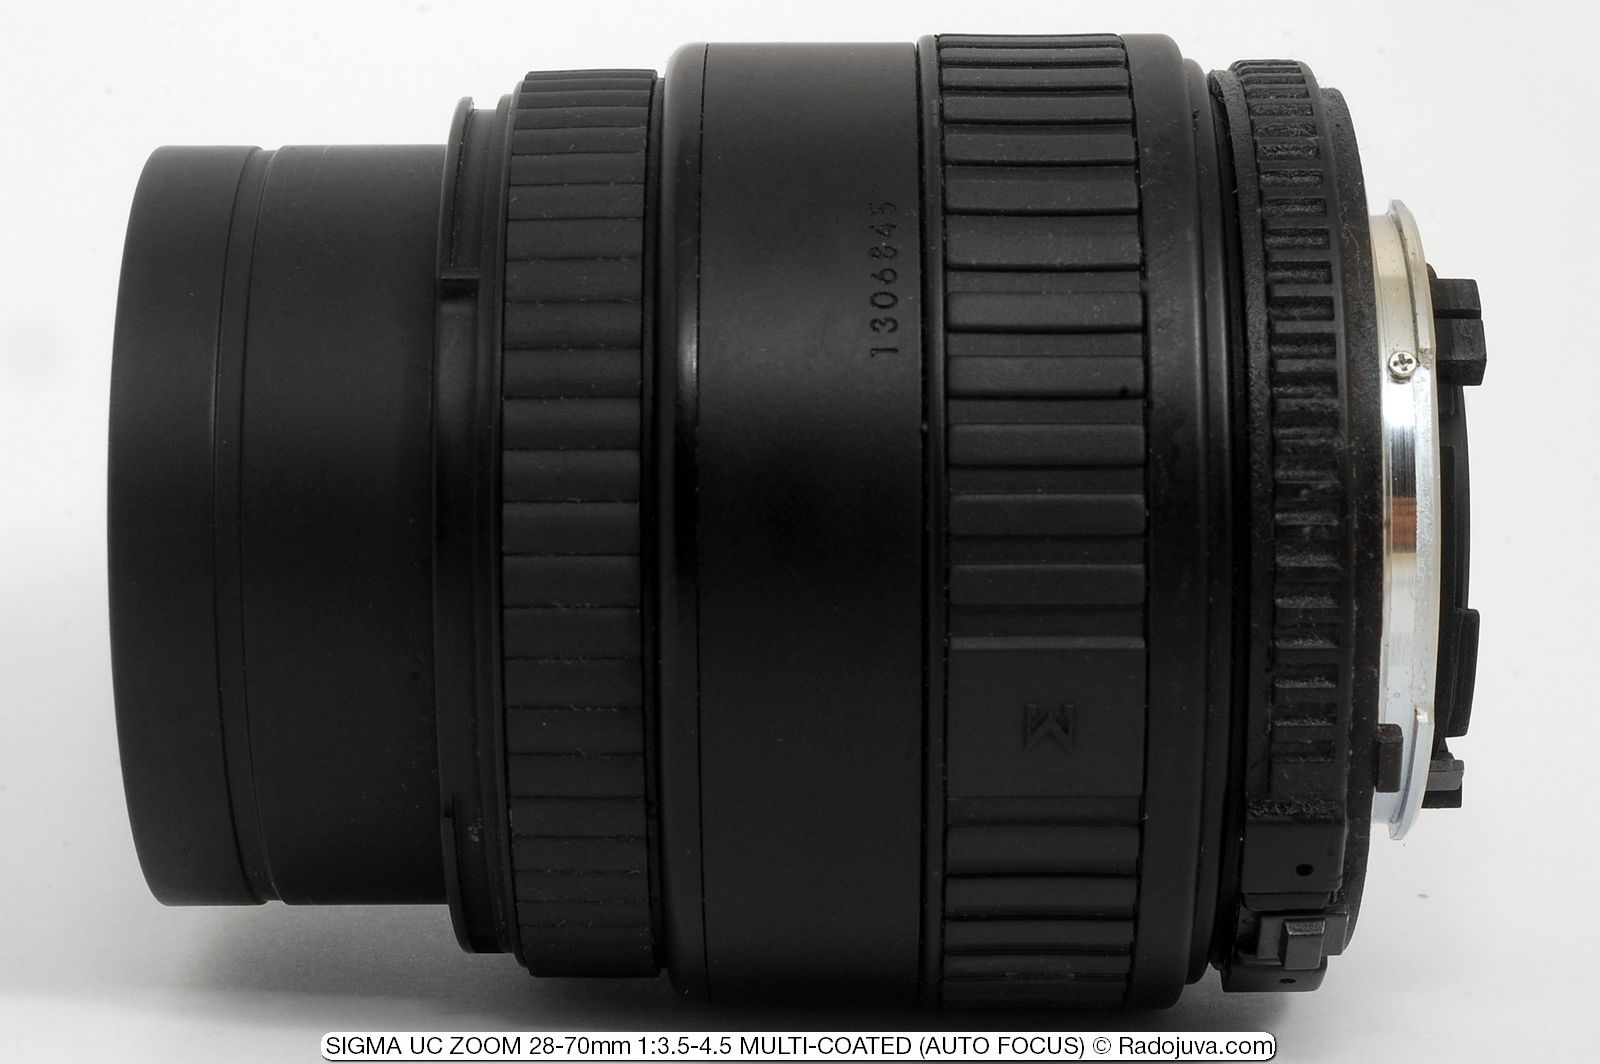 SIGMA UC ZOOM 28-70mm 1: 3.5-4.5 MULTI-COATED